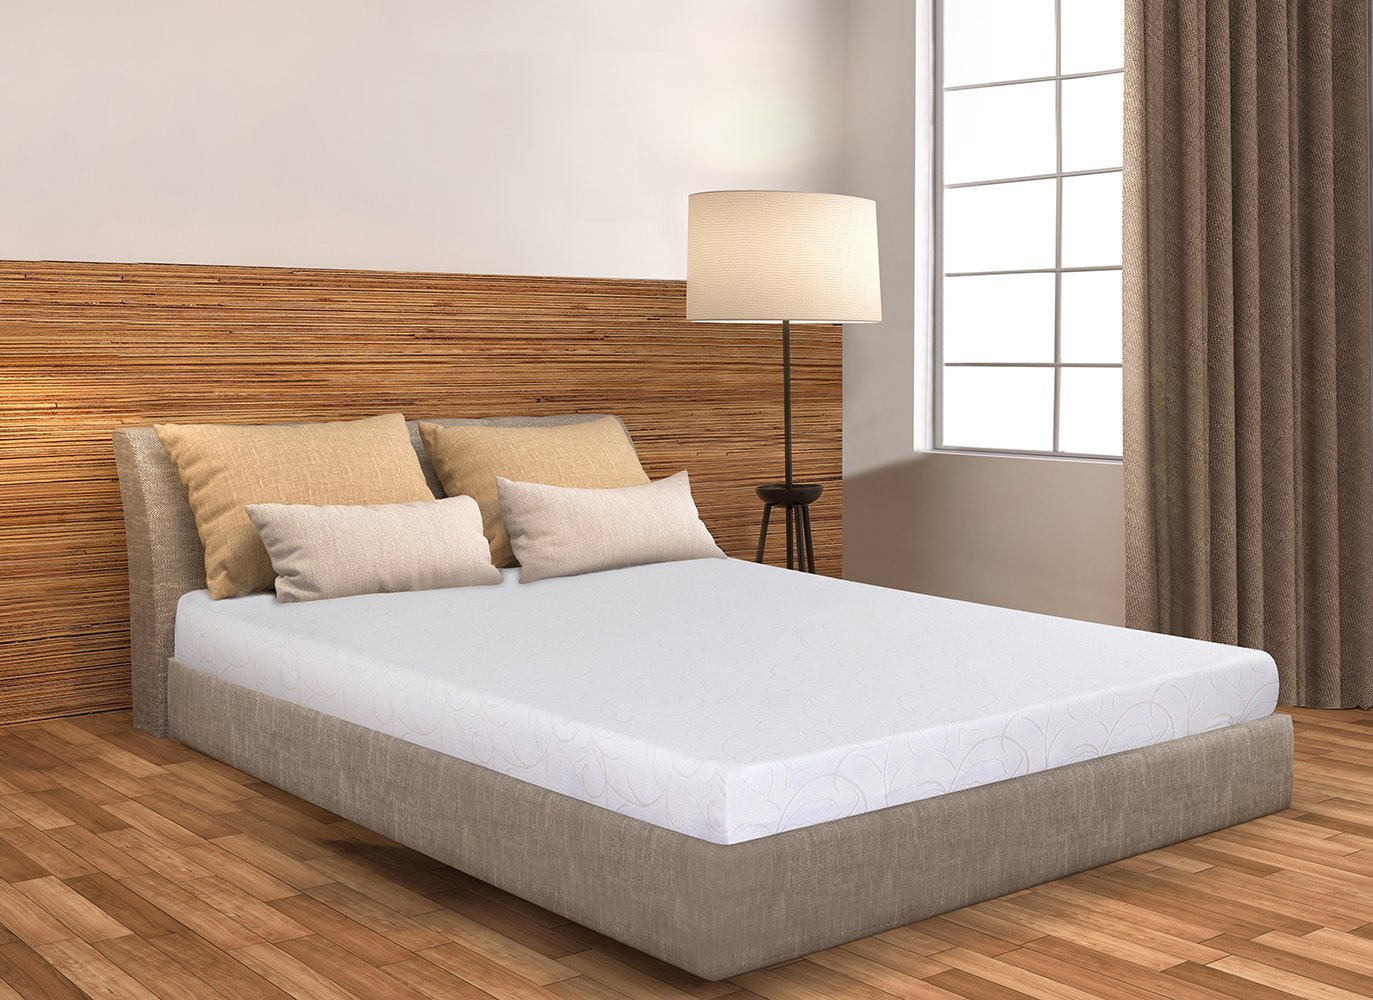 Olee Sleep 6 Inch Ventilation Memory Foam Mattress 06FM02 (Full)